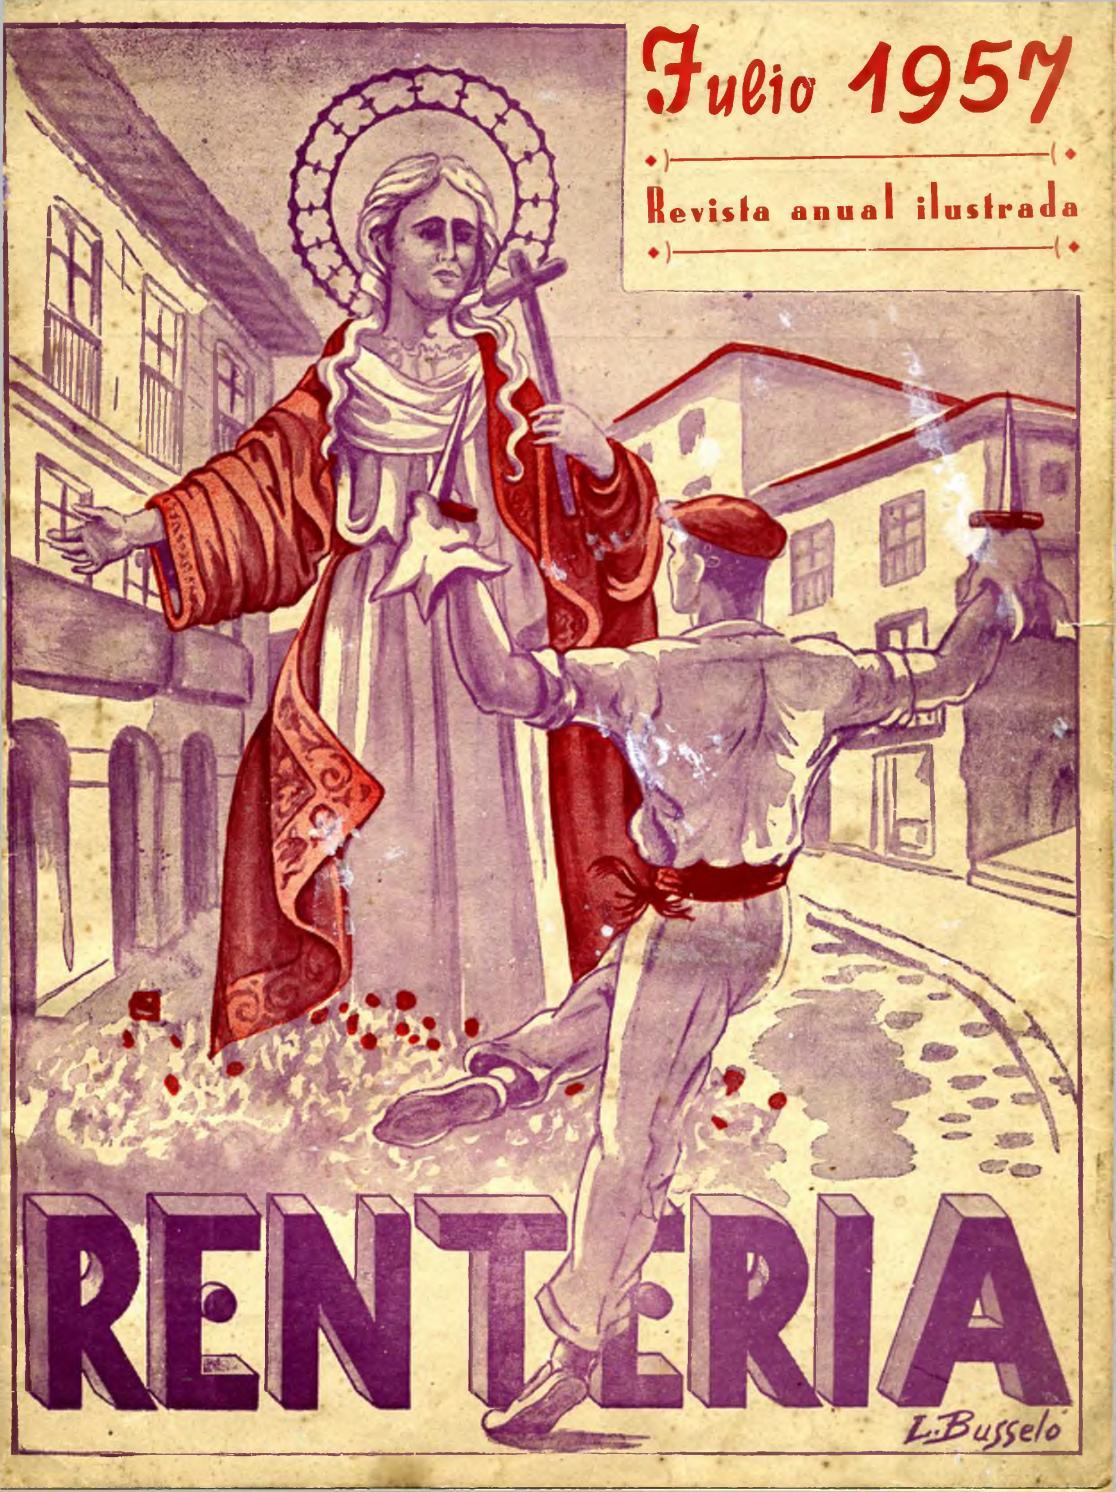 Rentería1957 by eua-ame - issuu